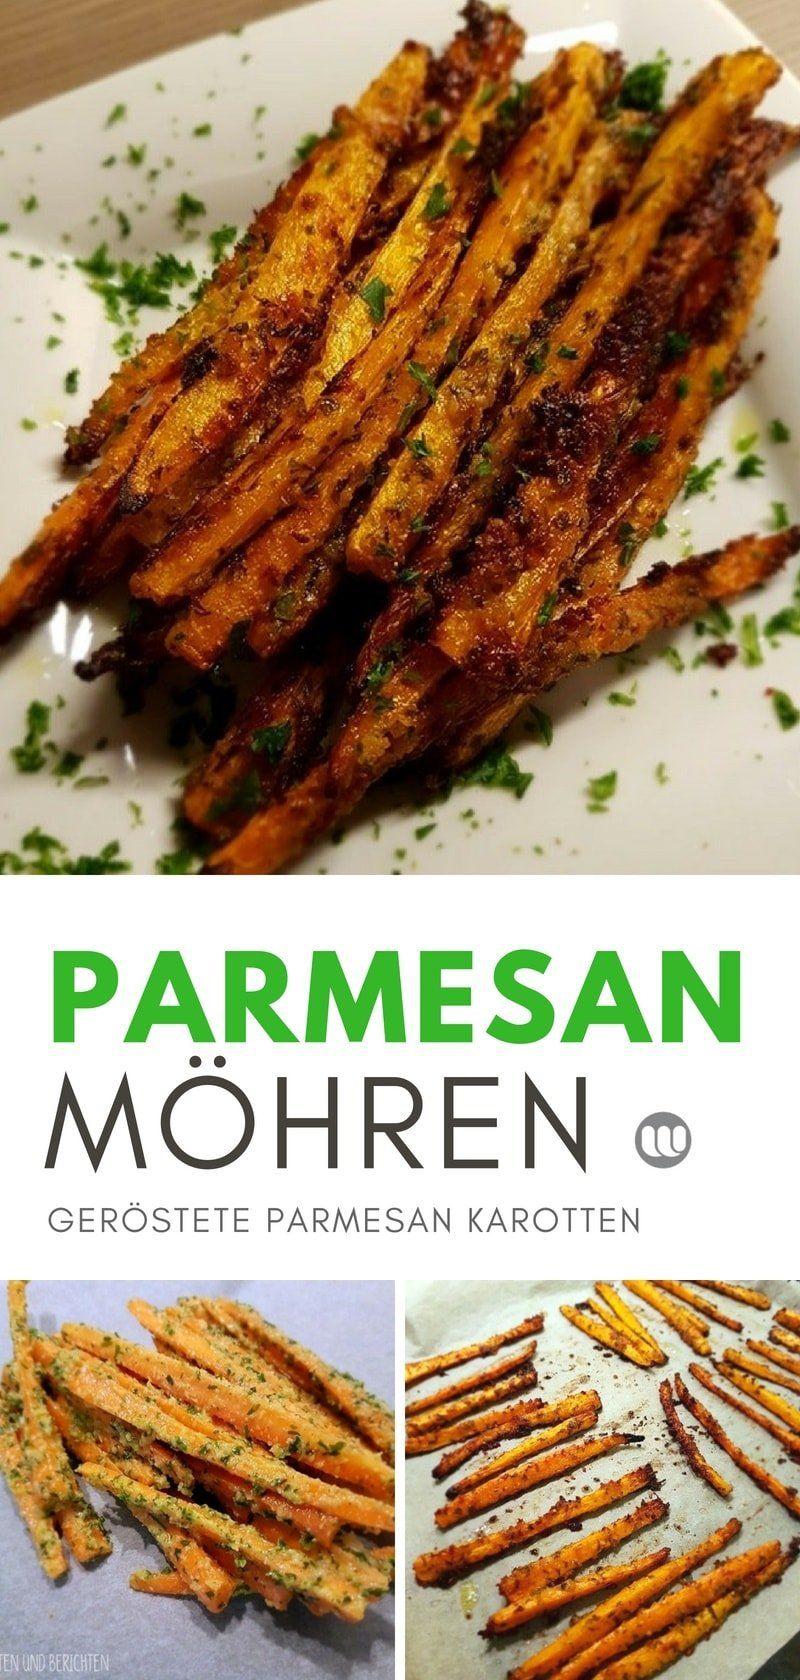 Rezept: Geröstete Parmesan Karottensticks, Möhrensticks